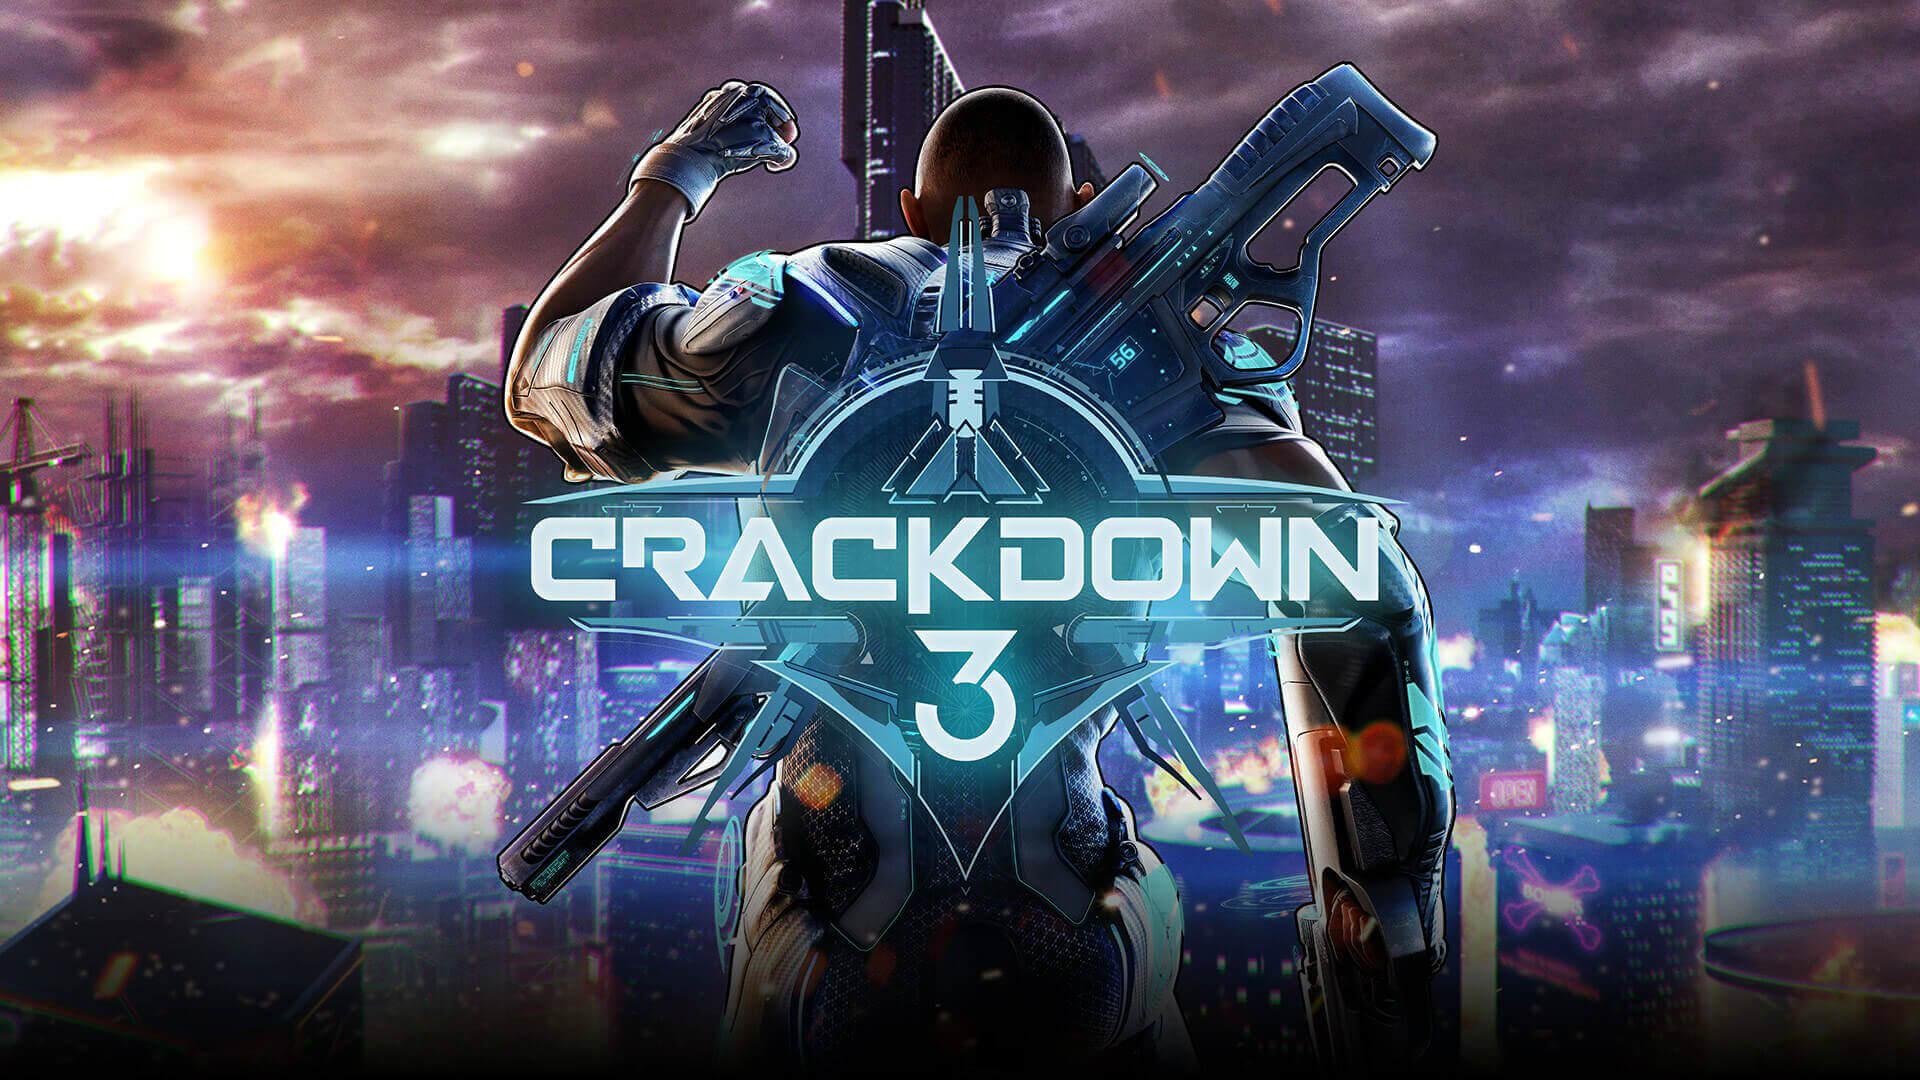 Rumor: Crackdown 3 Delayed to 2019